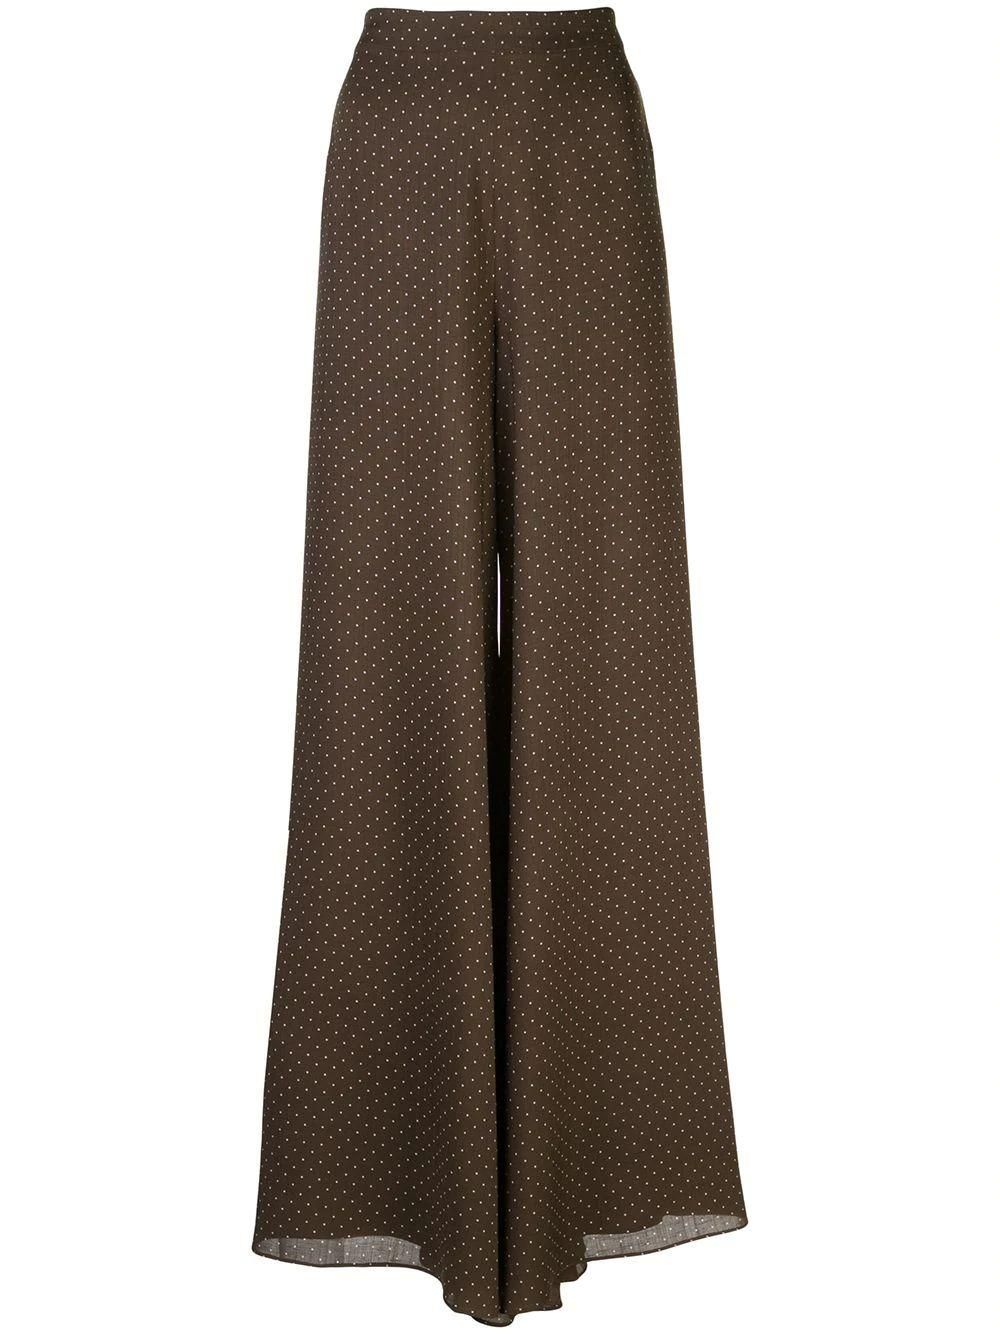 Antonin Linen Polka Dot Hw Wide Leg Pant Item # A1200625-6202